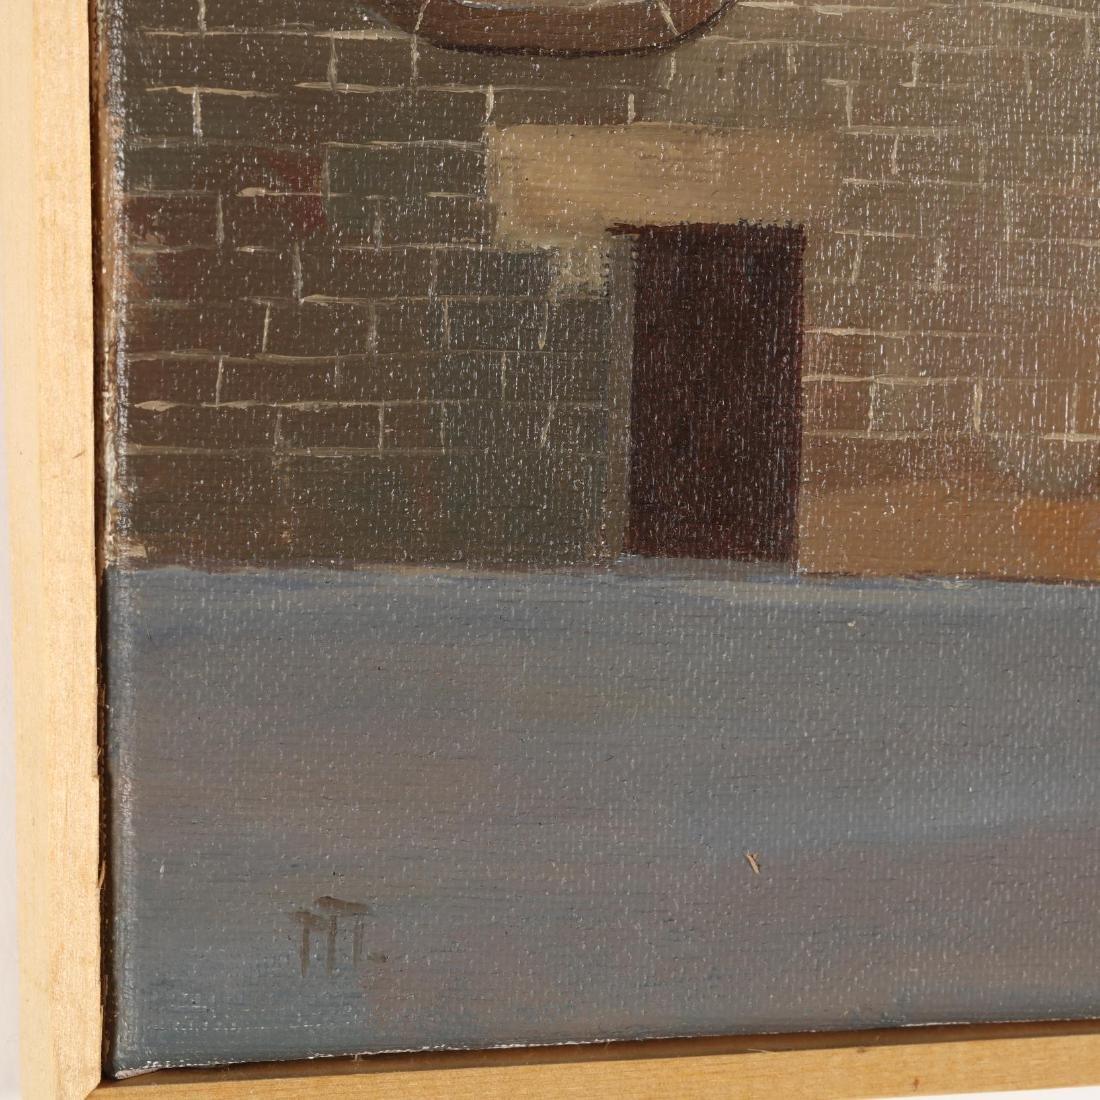 Cypriot Painting,  Famaugusta Gate, Nicosia - 2